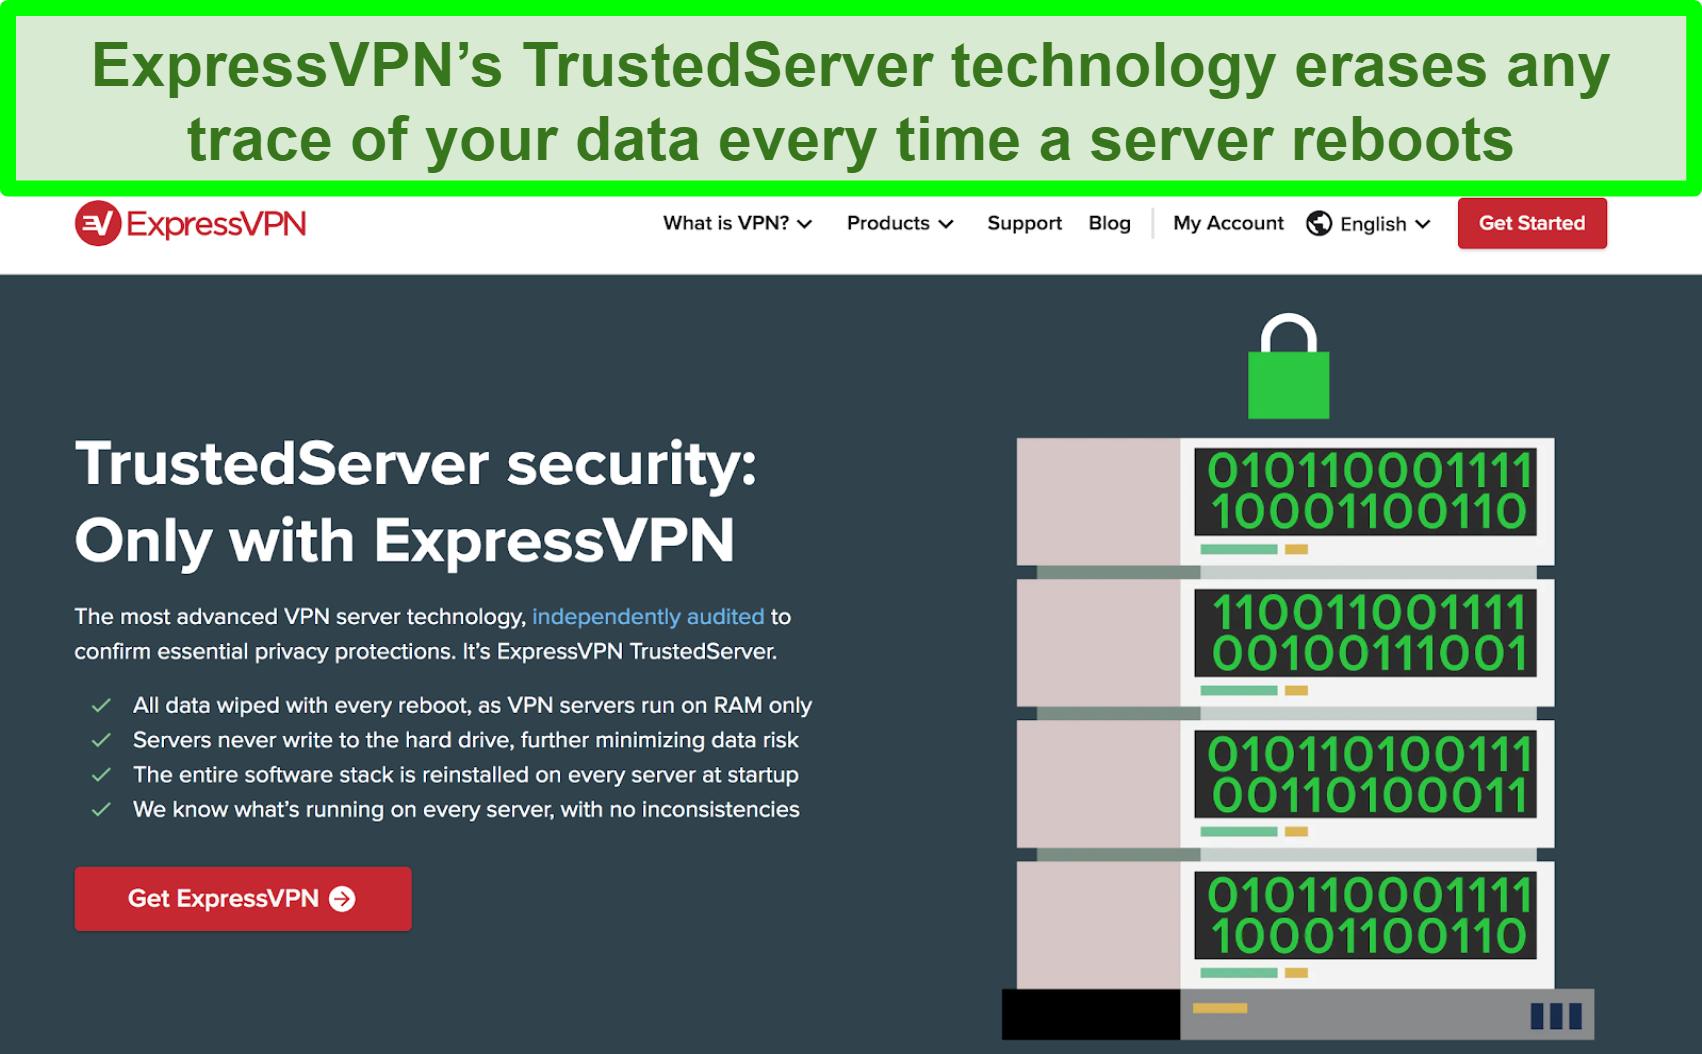 Screenshot of ExpressVPN website explaining TrustedServer technology